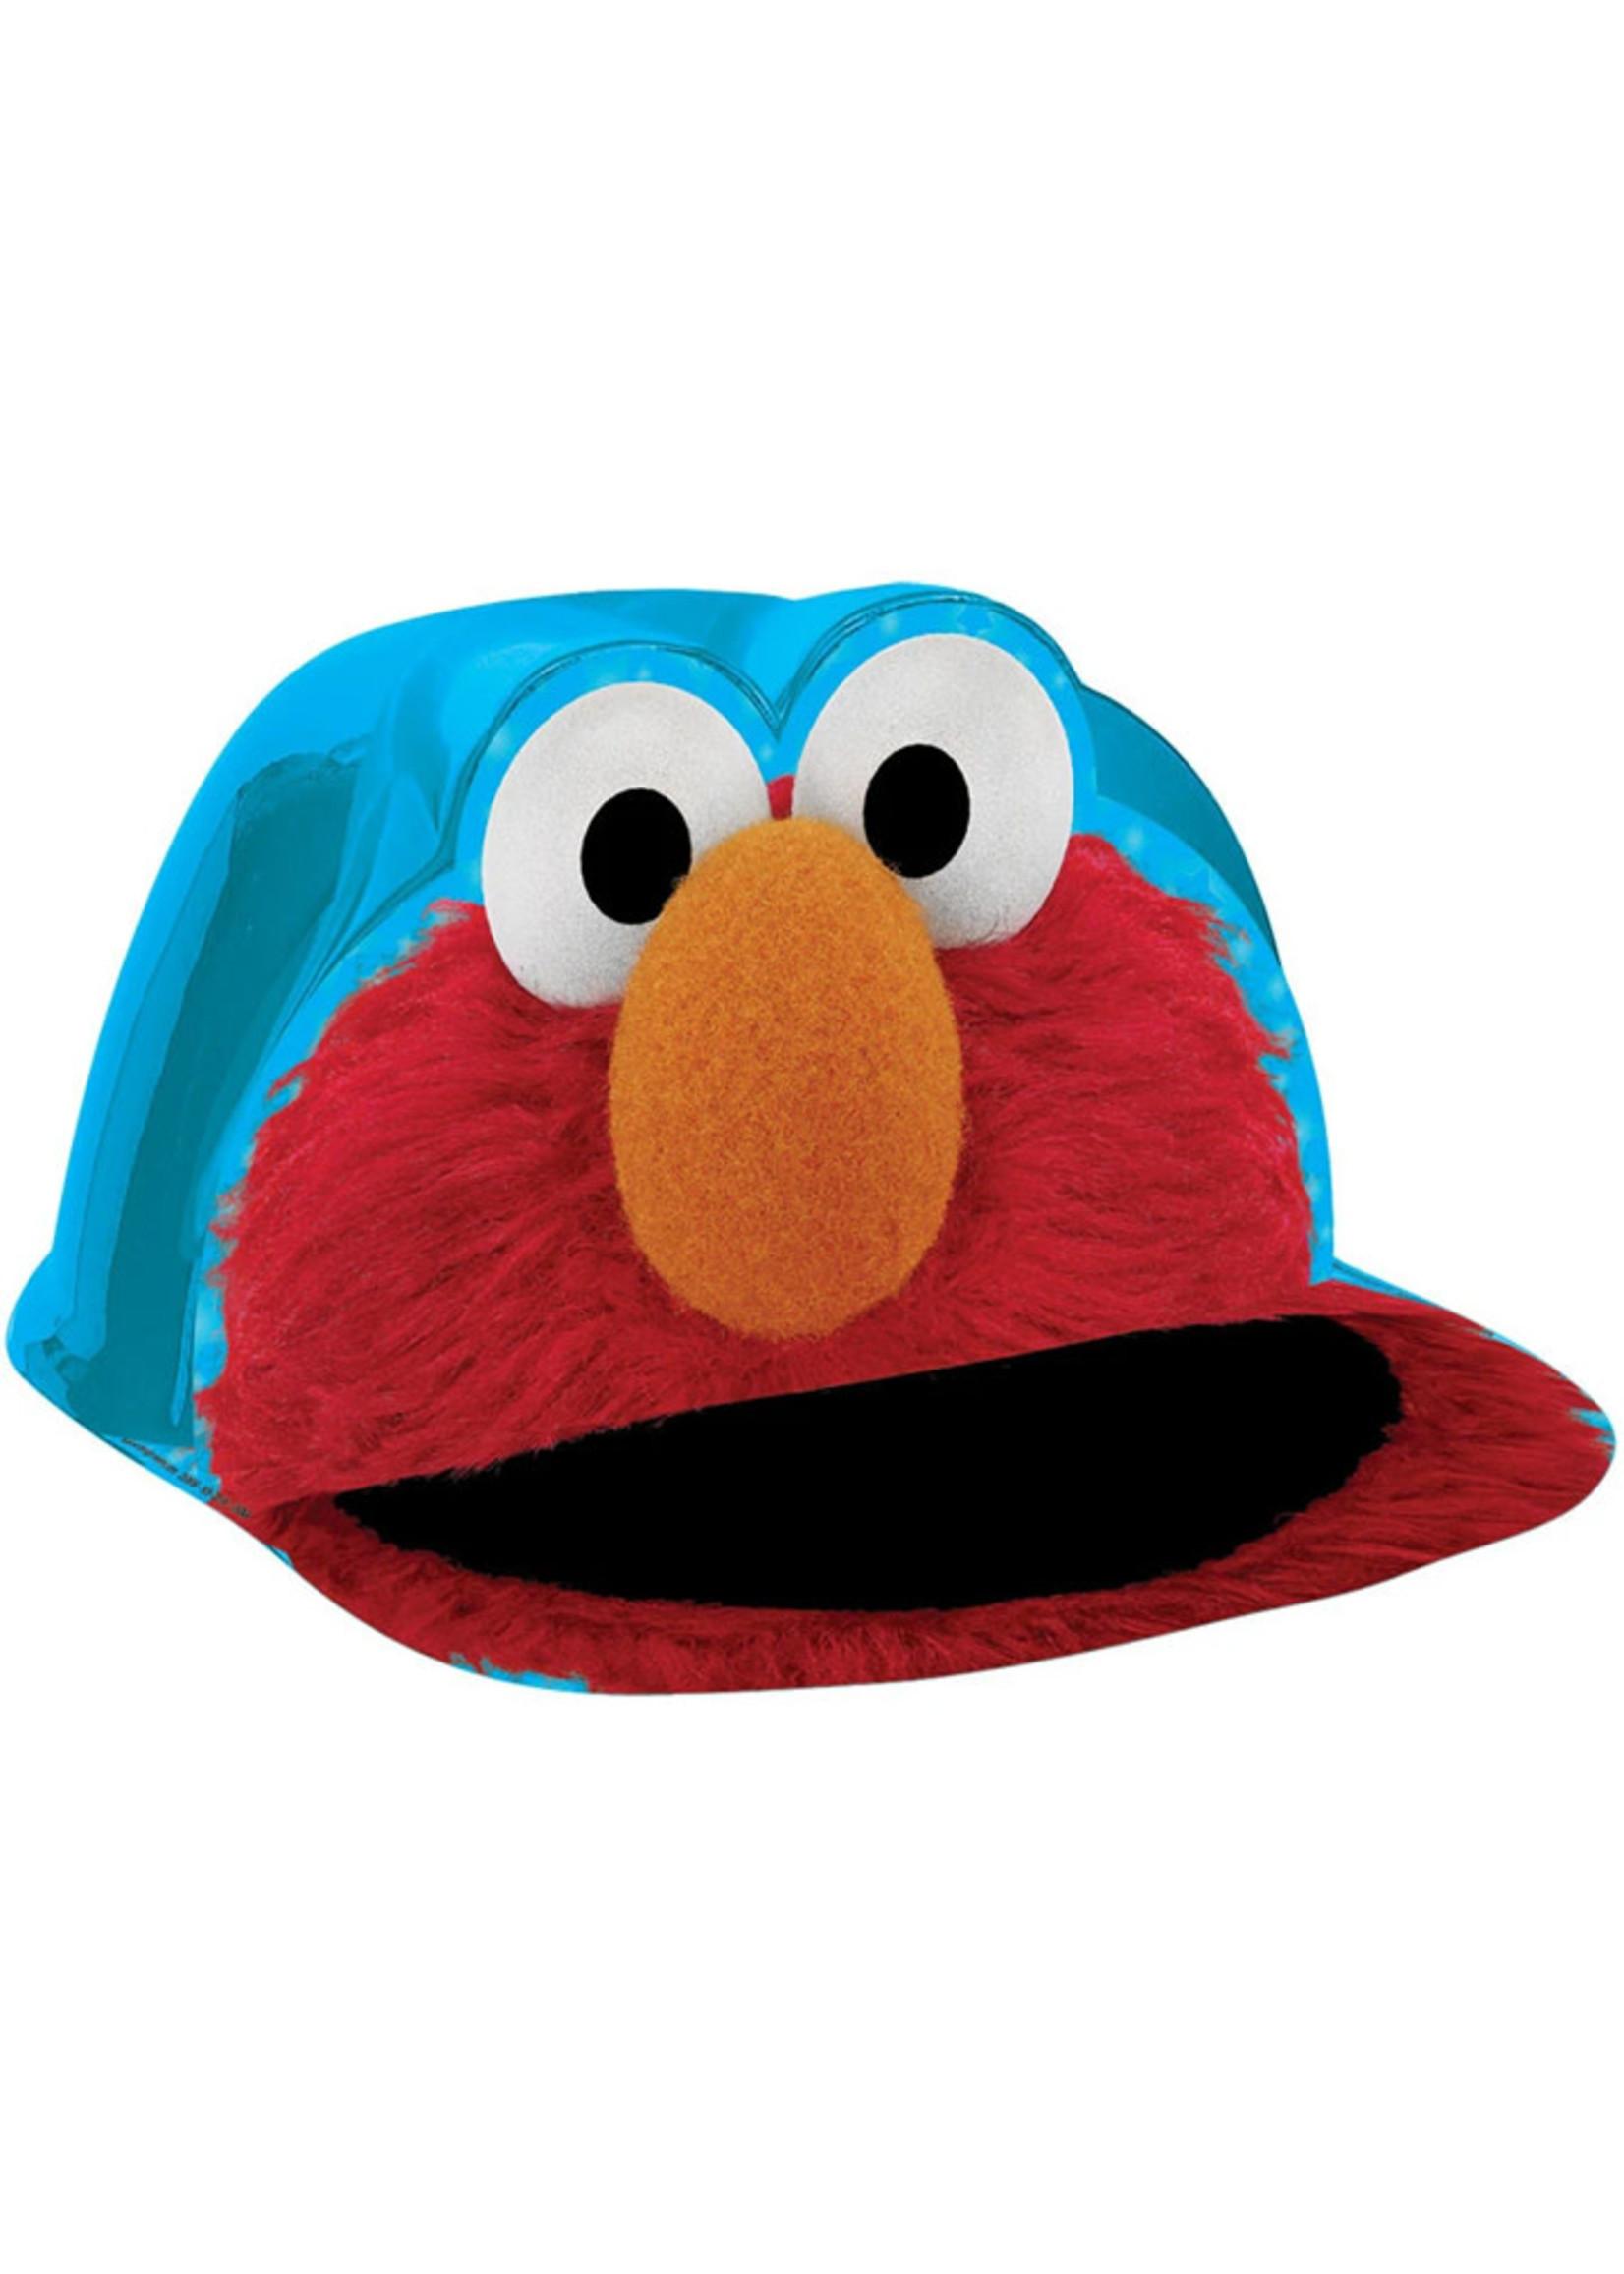 Sesame Street Plastic Party Hat